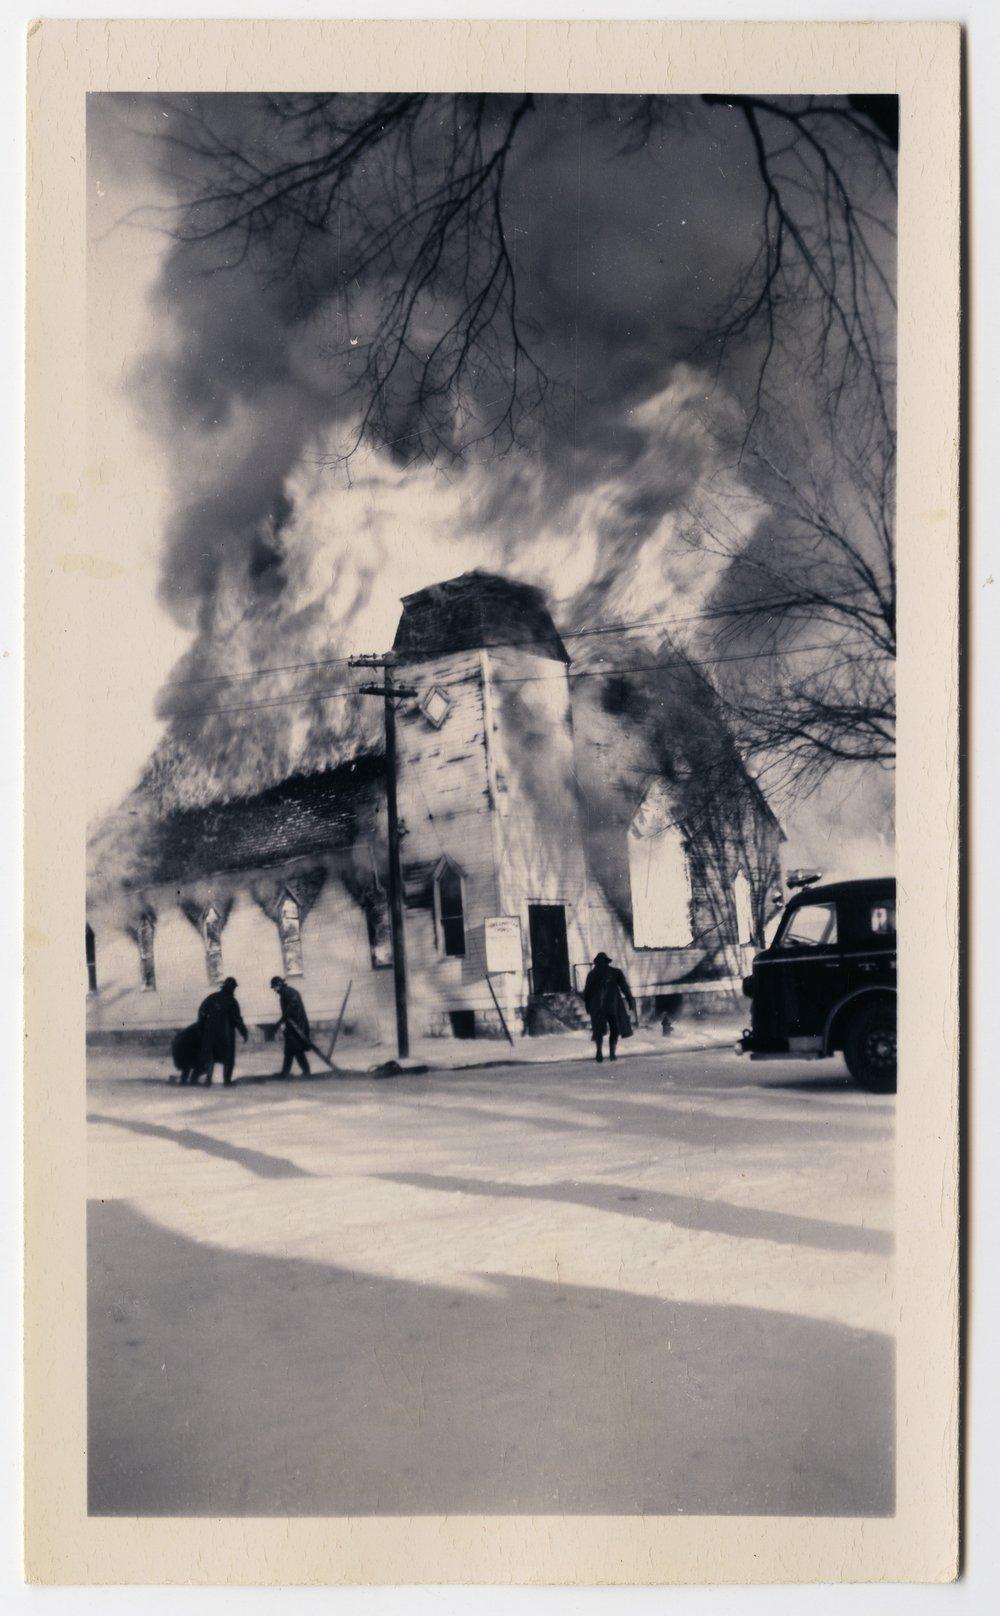 Fire at the Third Christian Church in Topeka, Kansas - 5